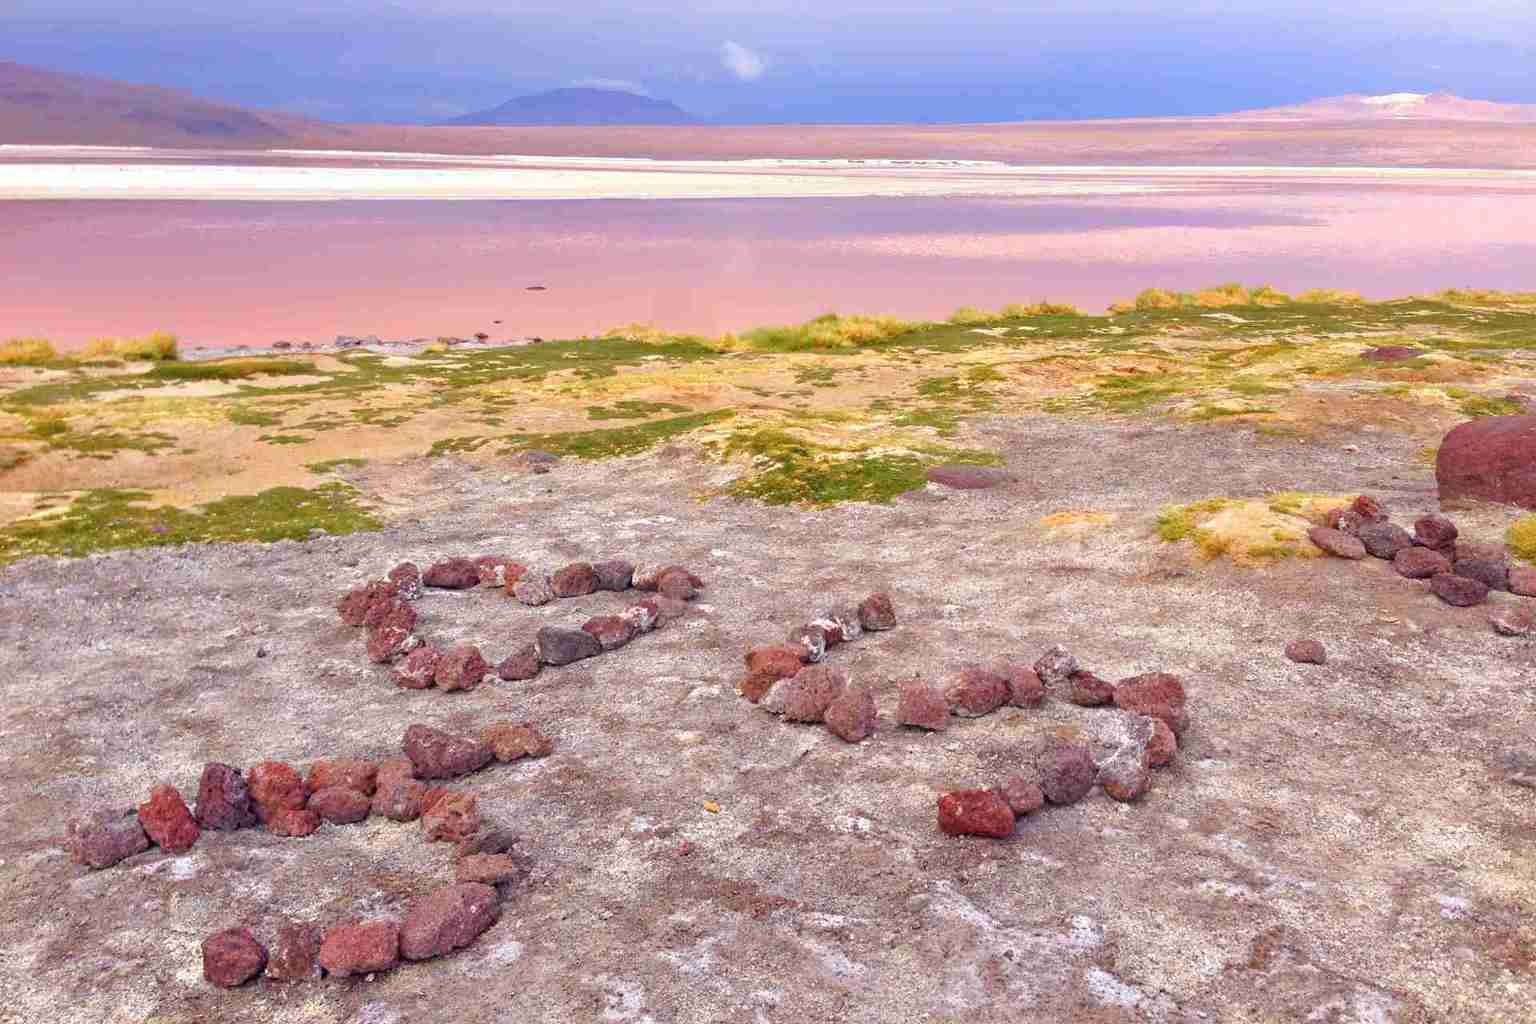 Salar de Uyuni - The Bolivian Salt Flats in 21 Stunning Photos